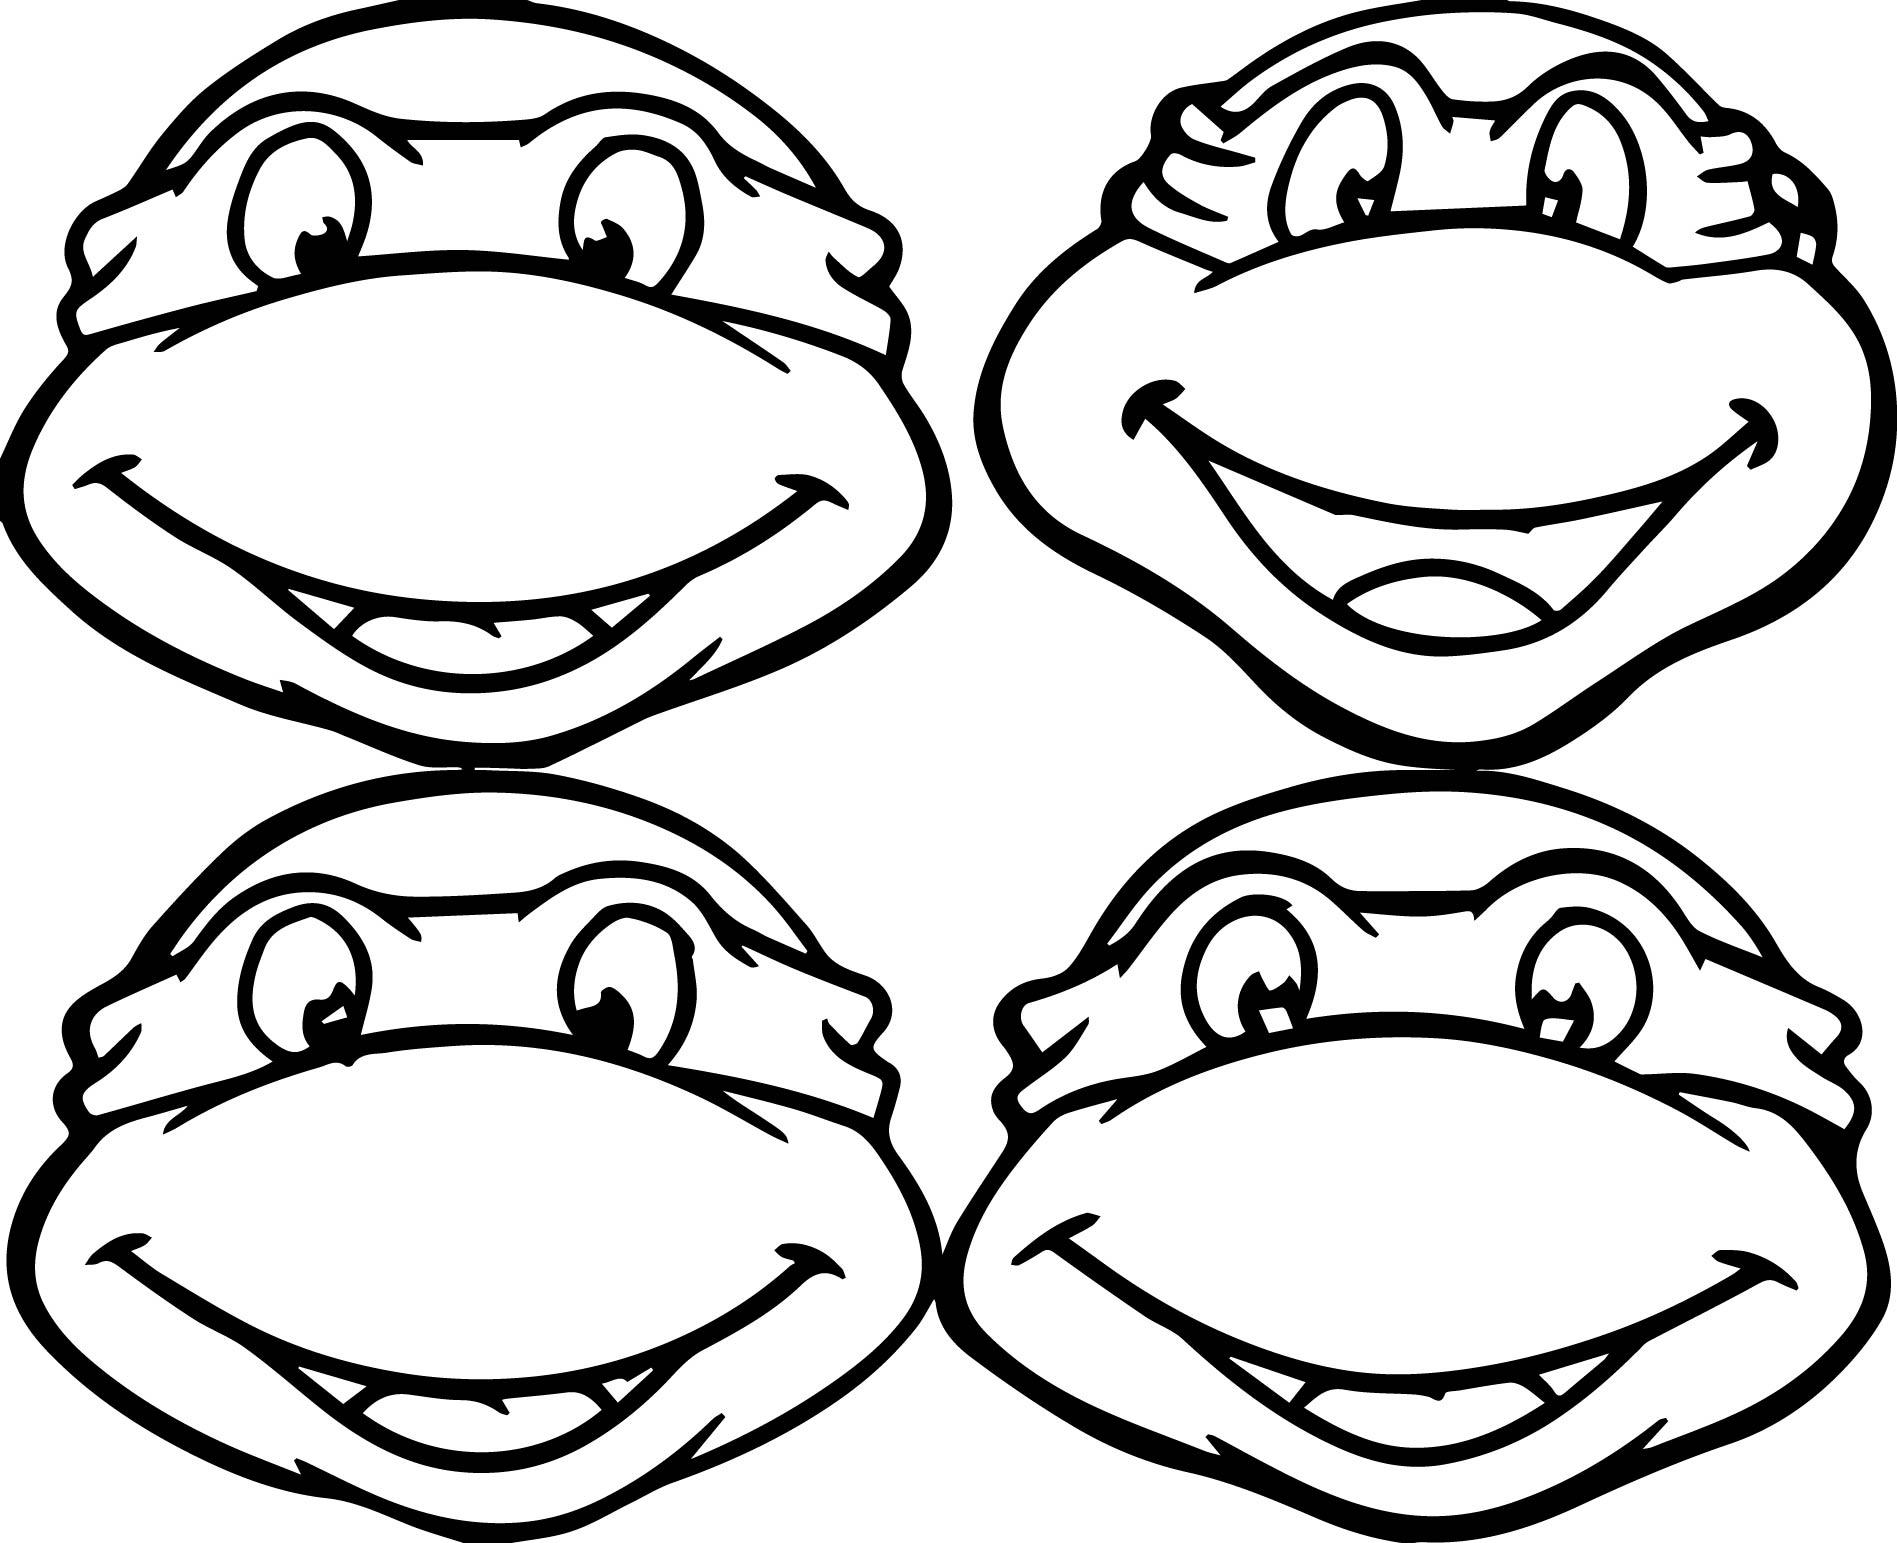 Leonardo Ninja Turtle Drawing At Getdrawings